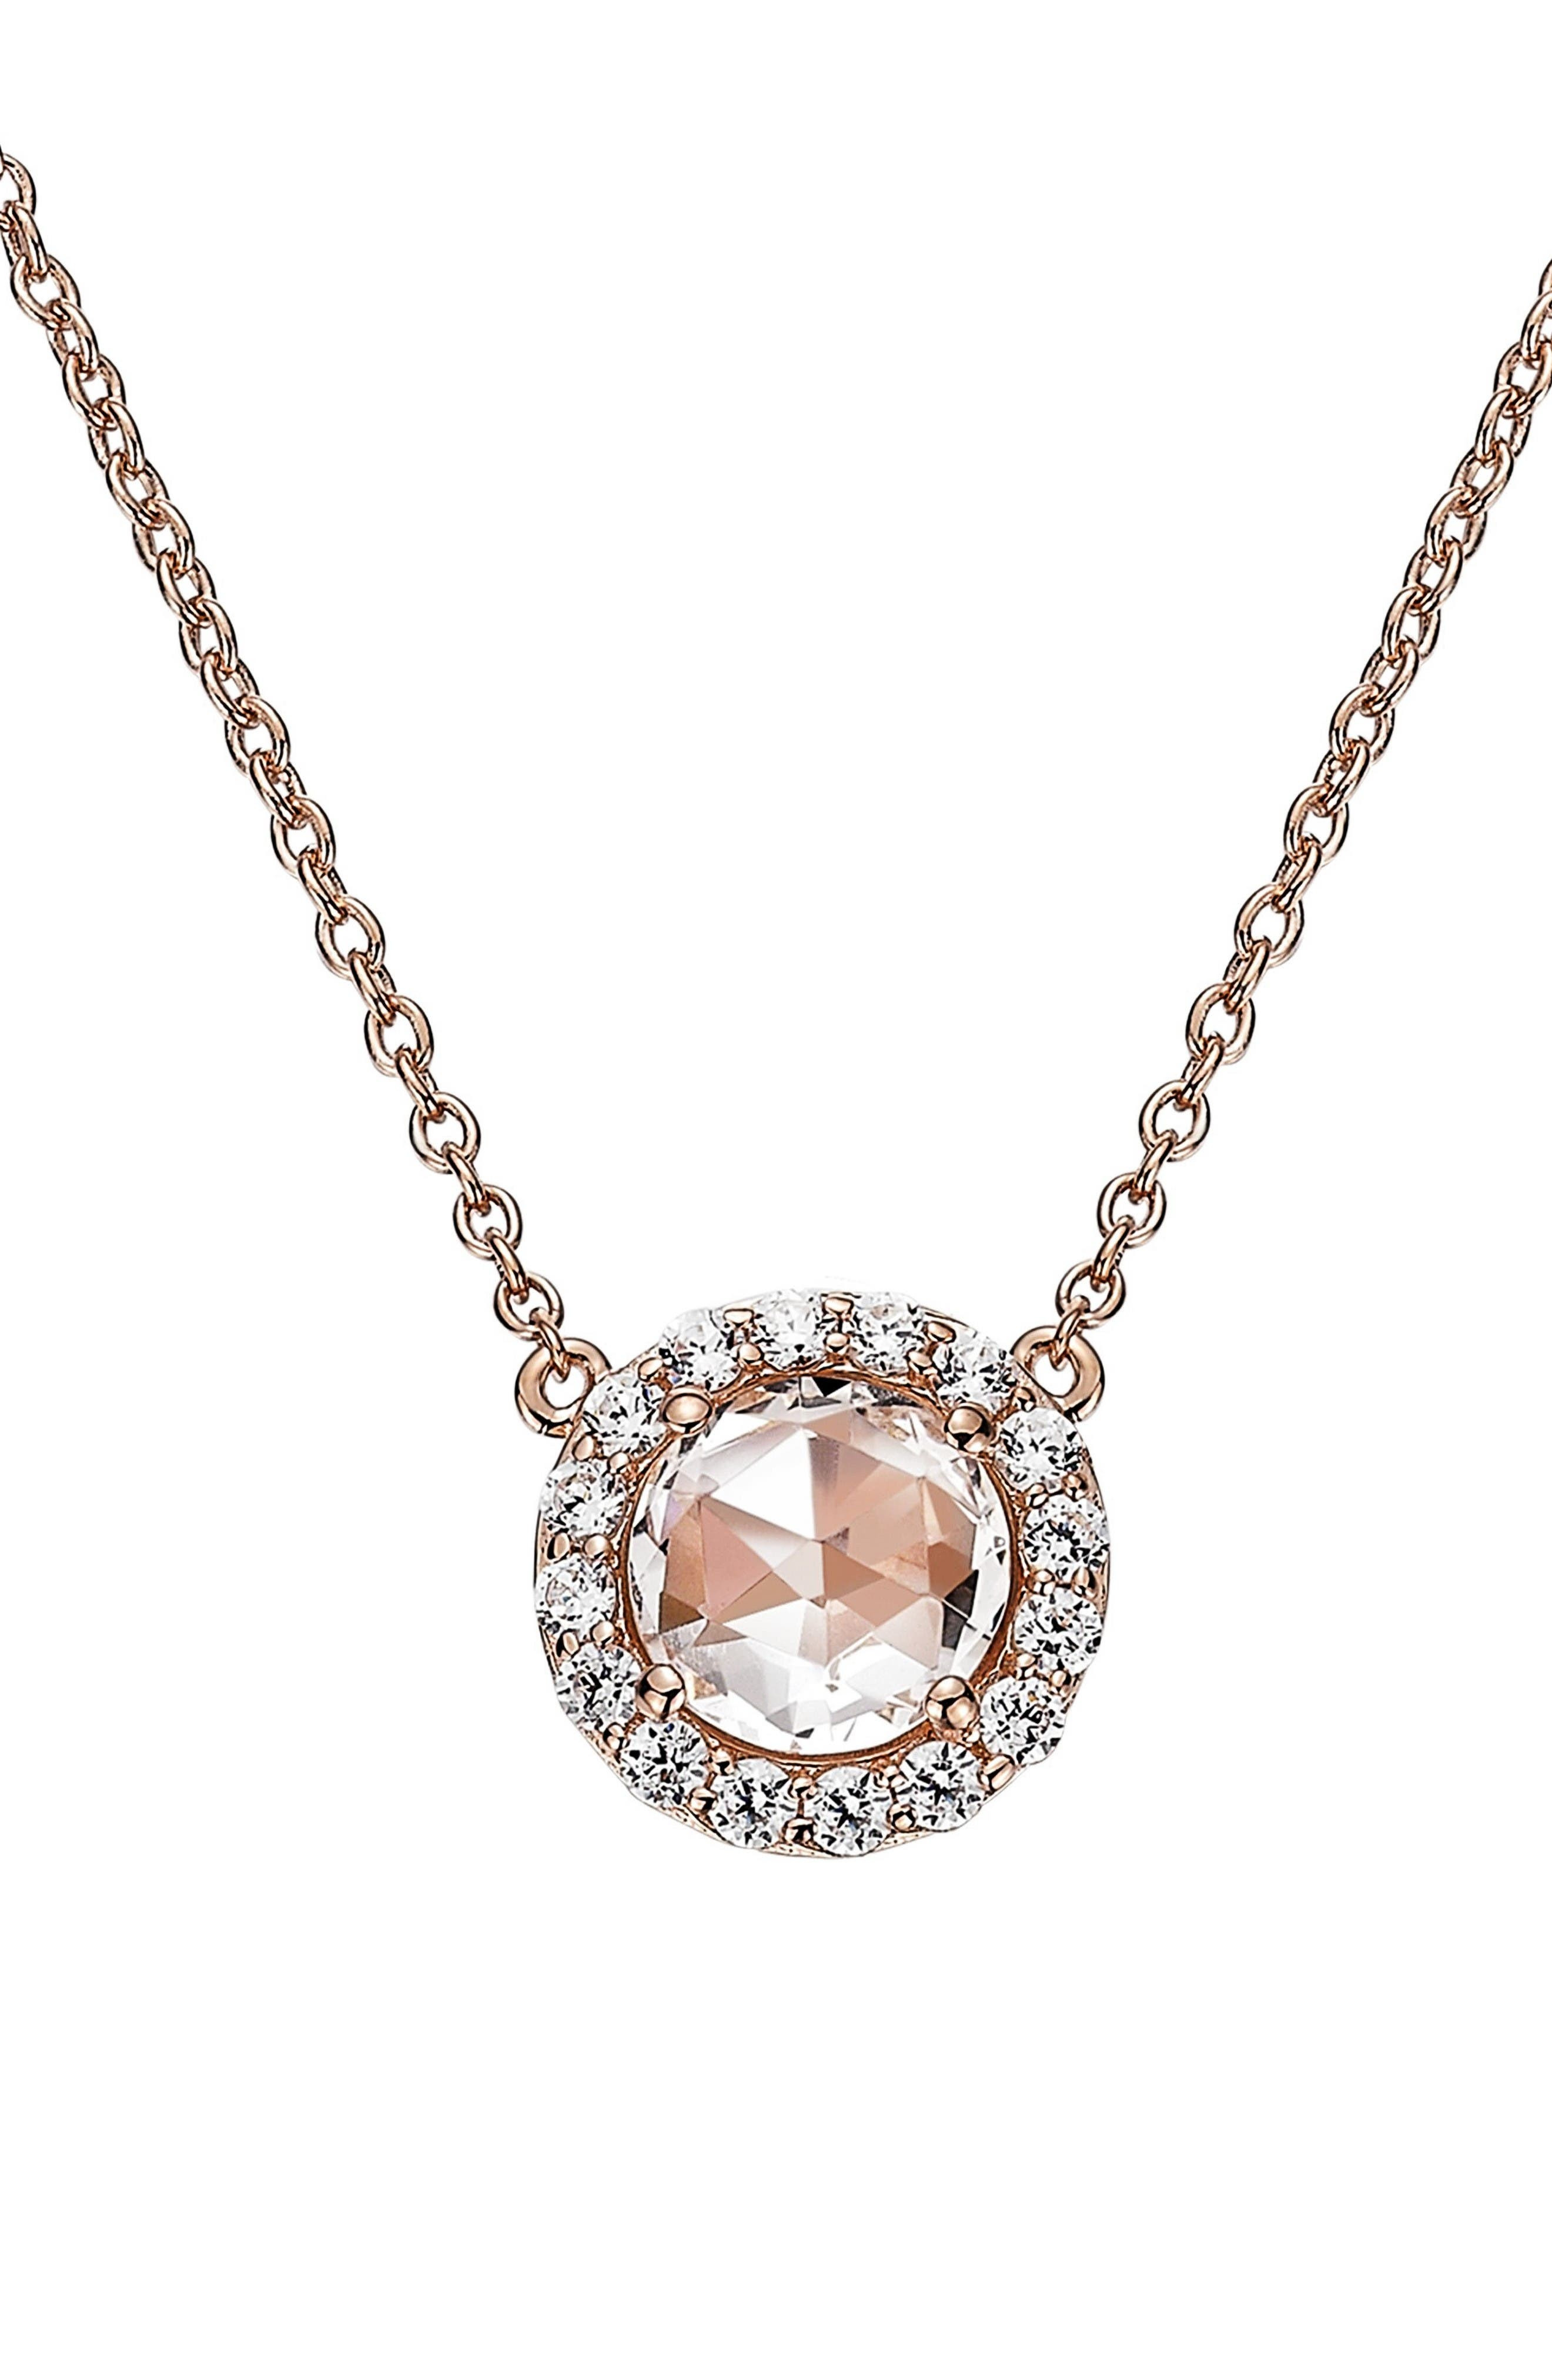 Main Image - Lafonn Simulated Diamond Pendant Necklace